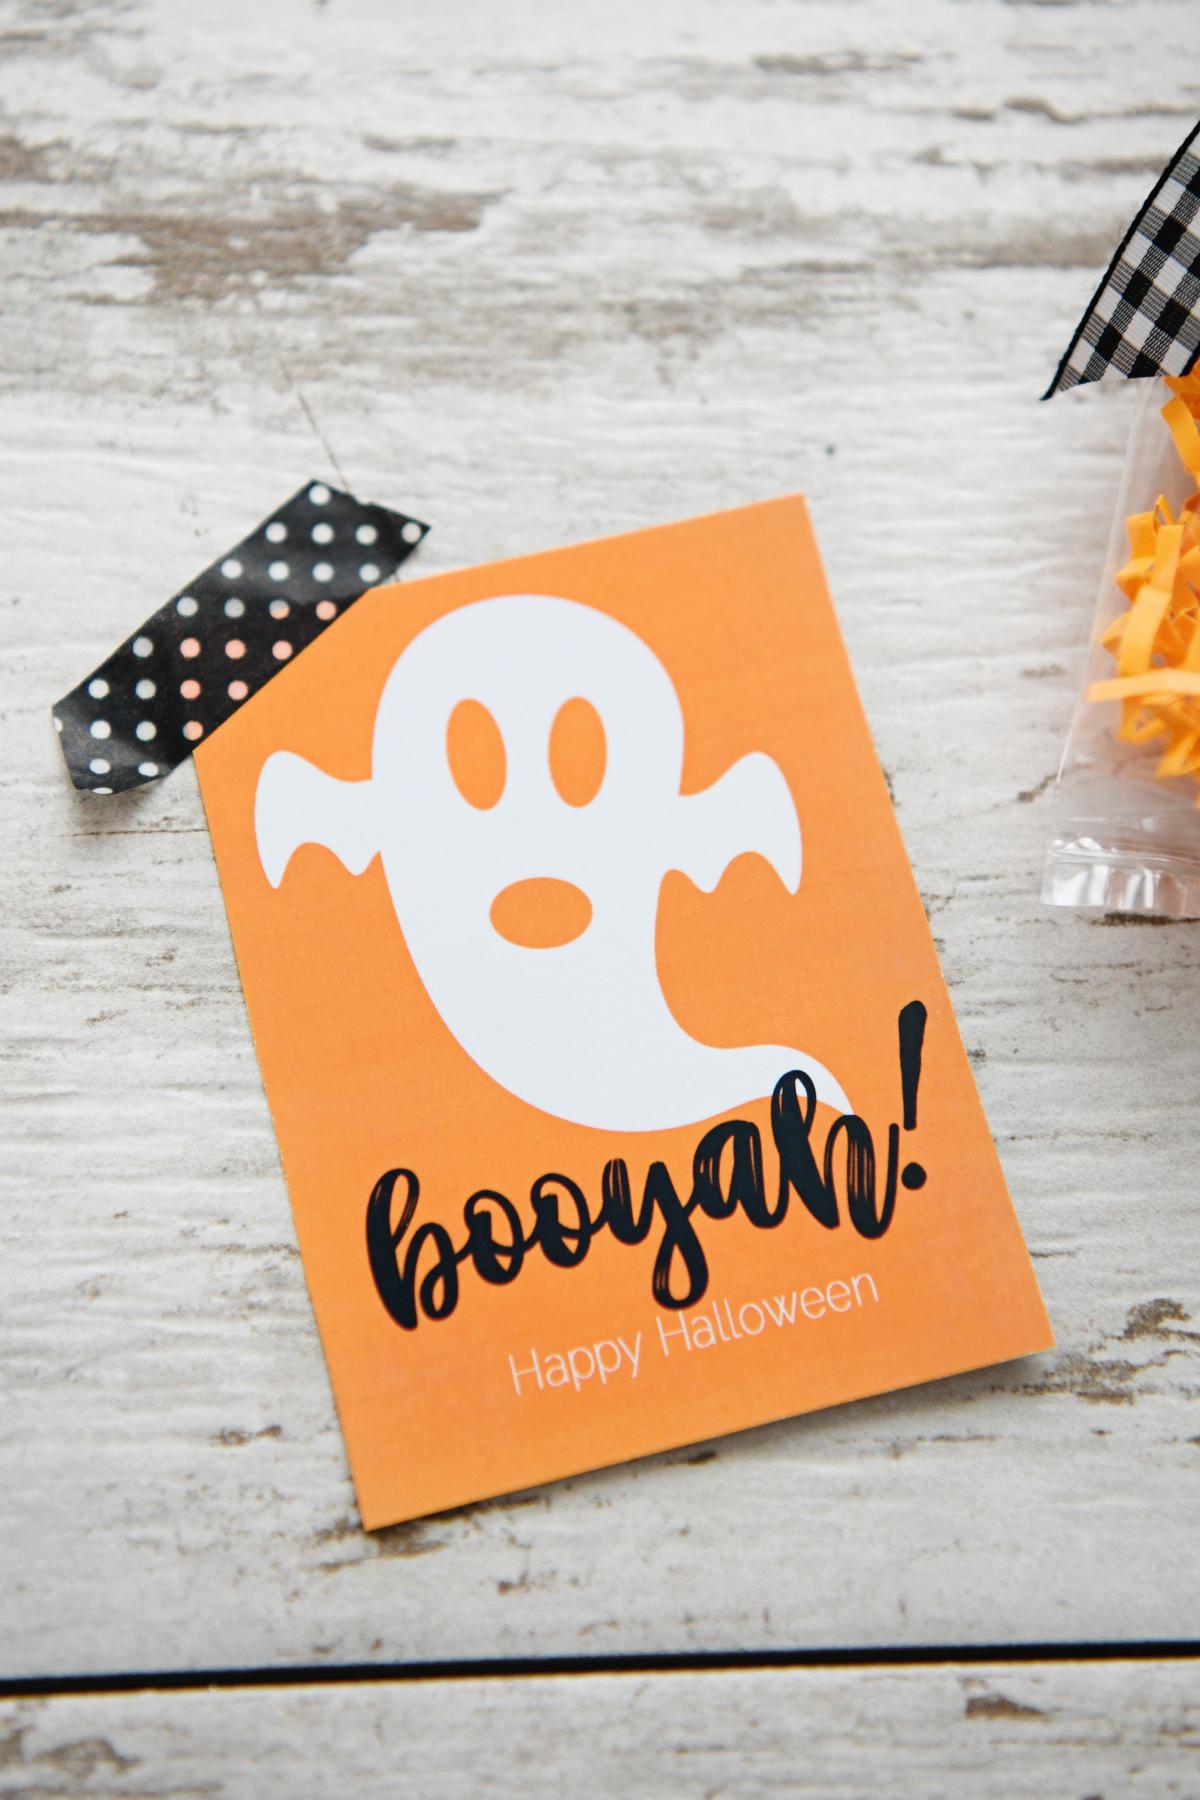 Booyah halloween tags